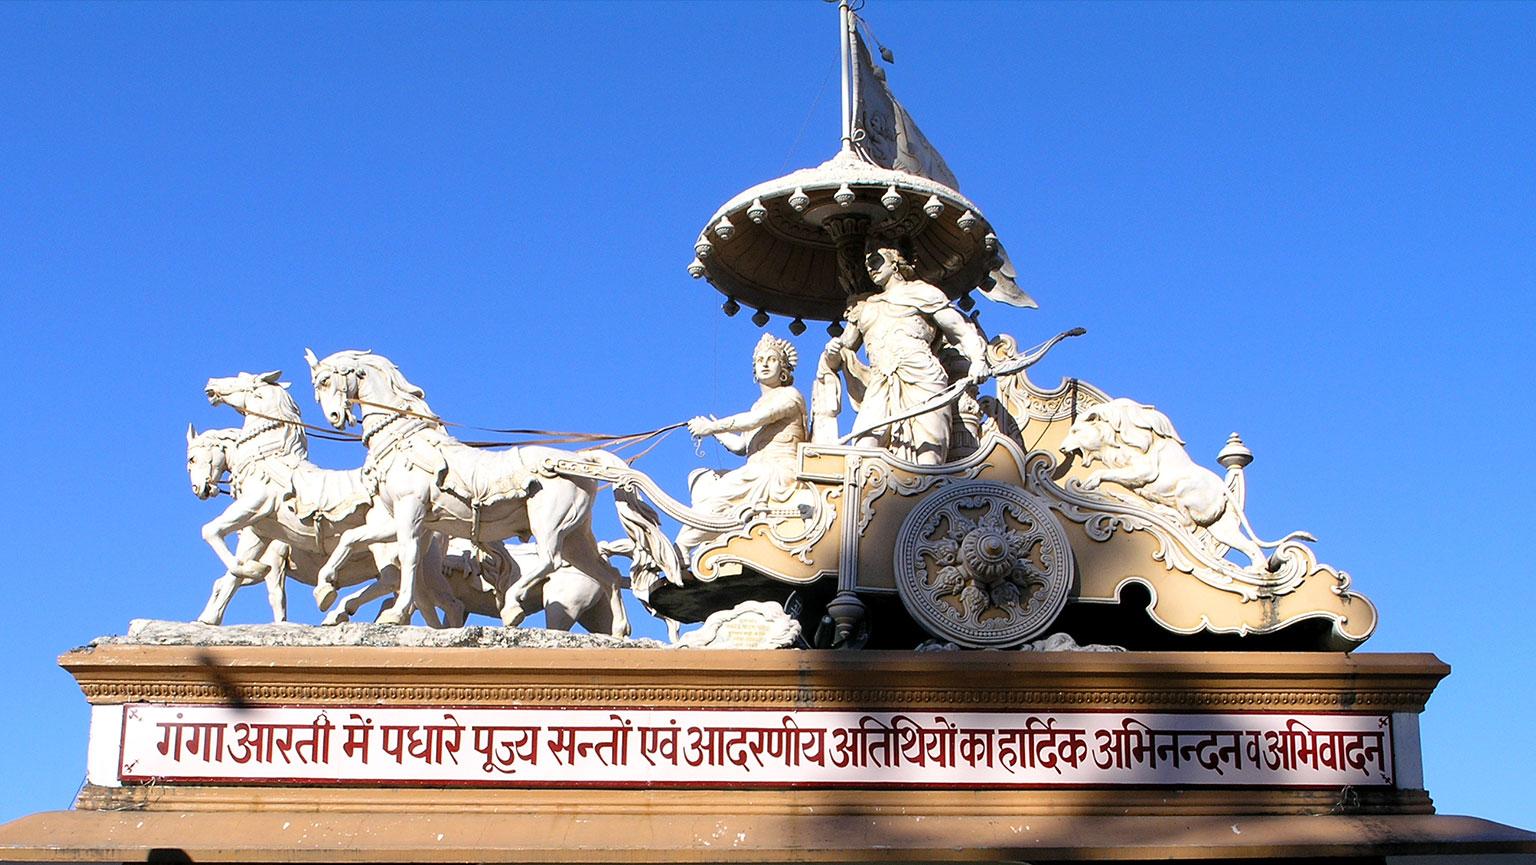 Laws of Manu and Bhagavad Gita